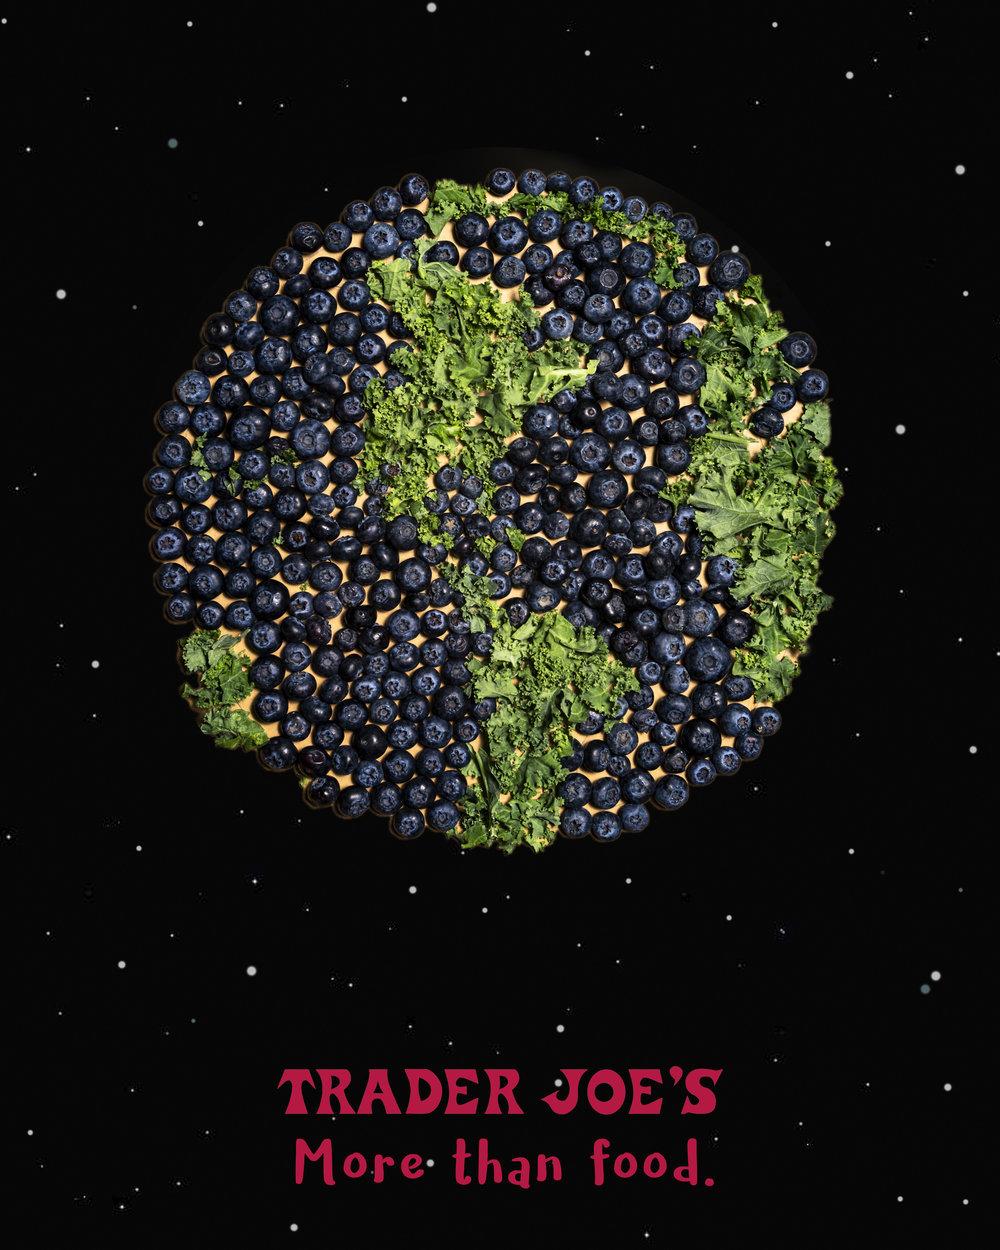 trader joes earth.jpg